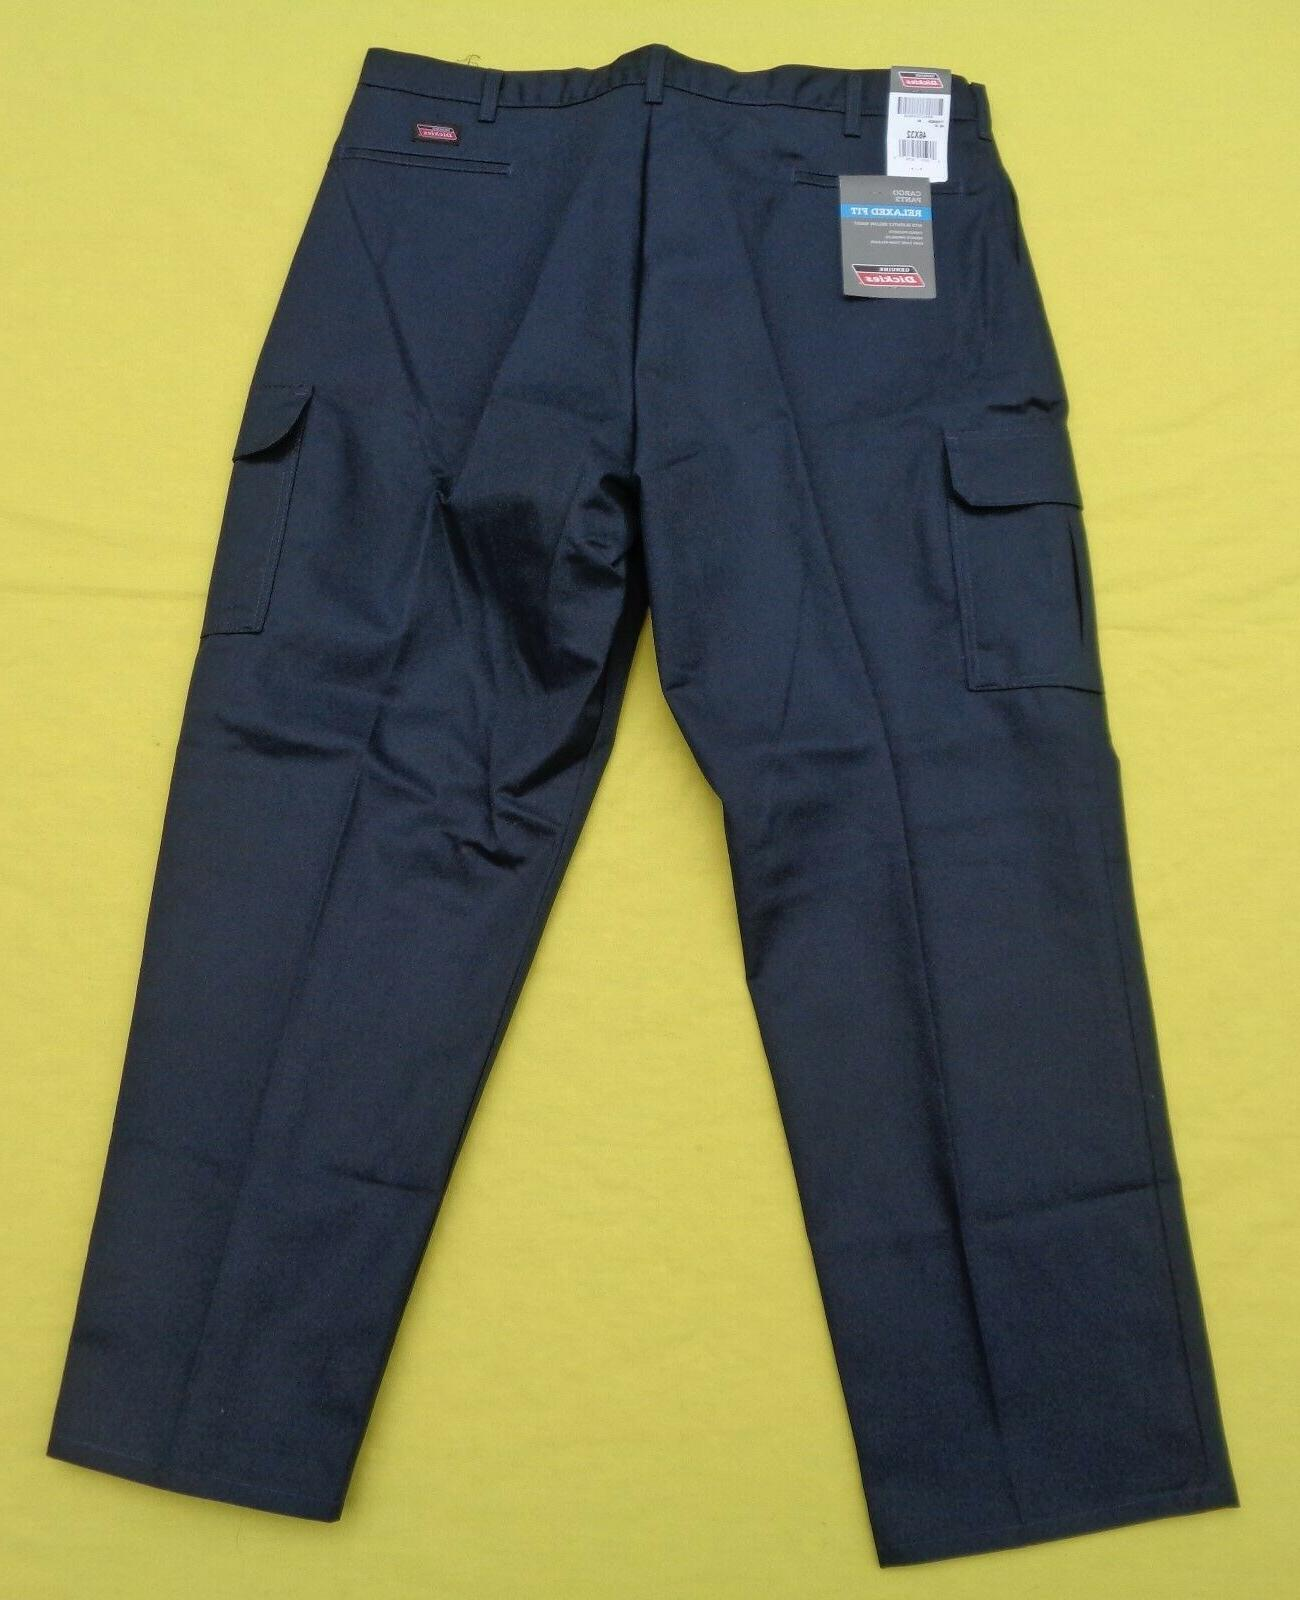 hn41 work pants navy blue uniform relaxed